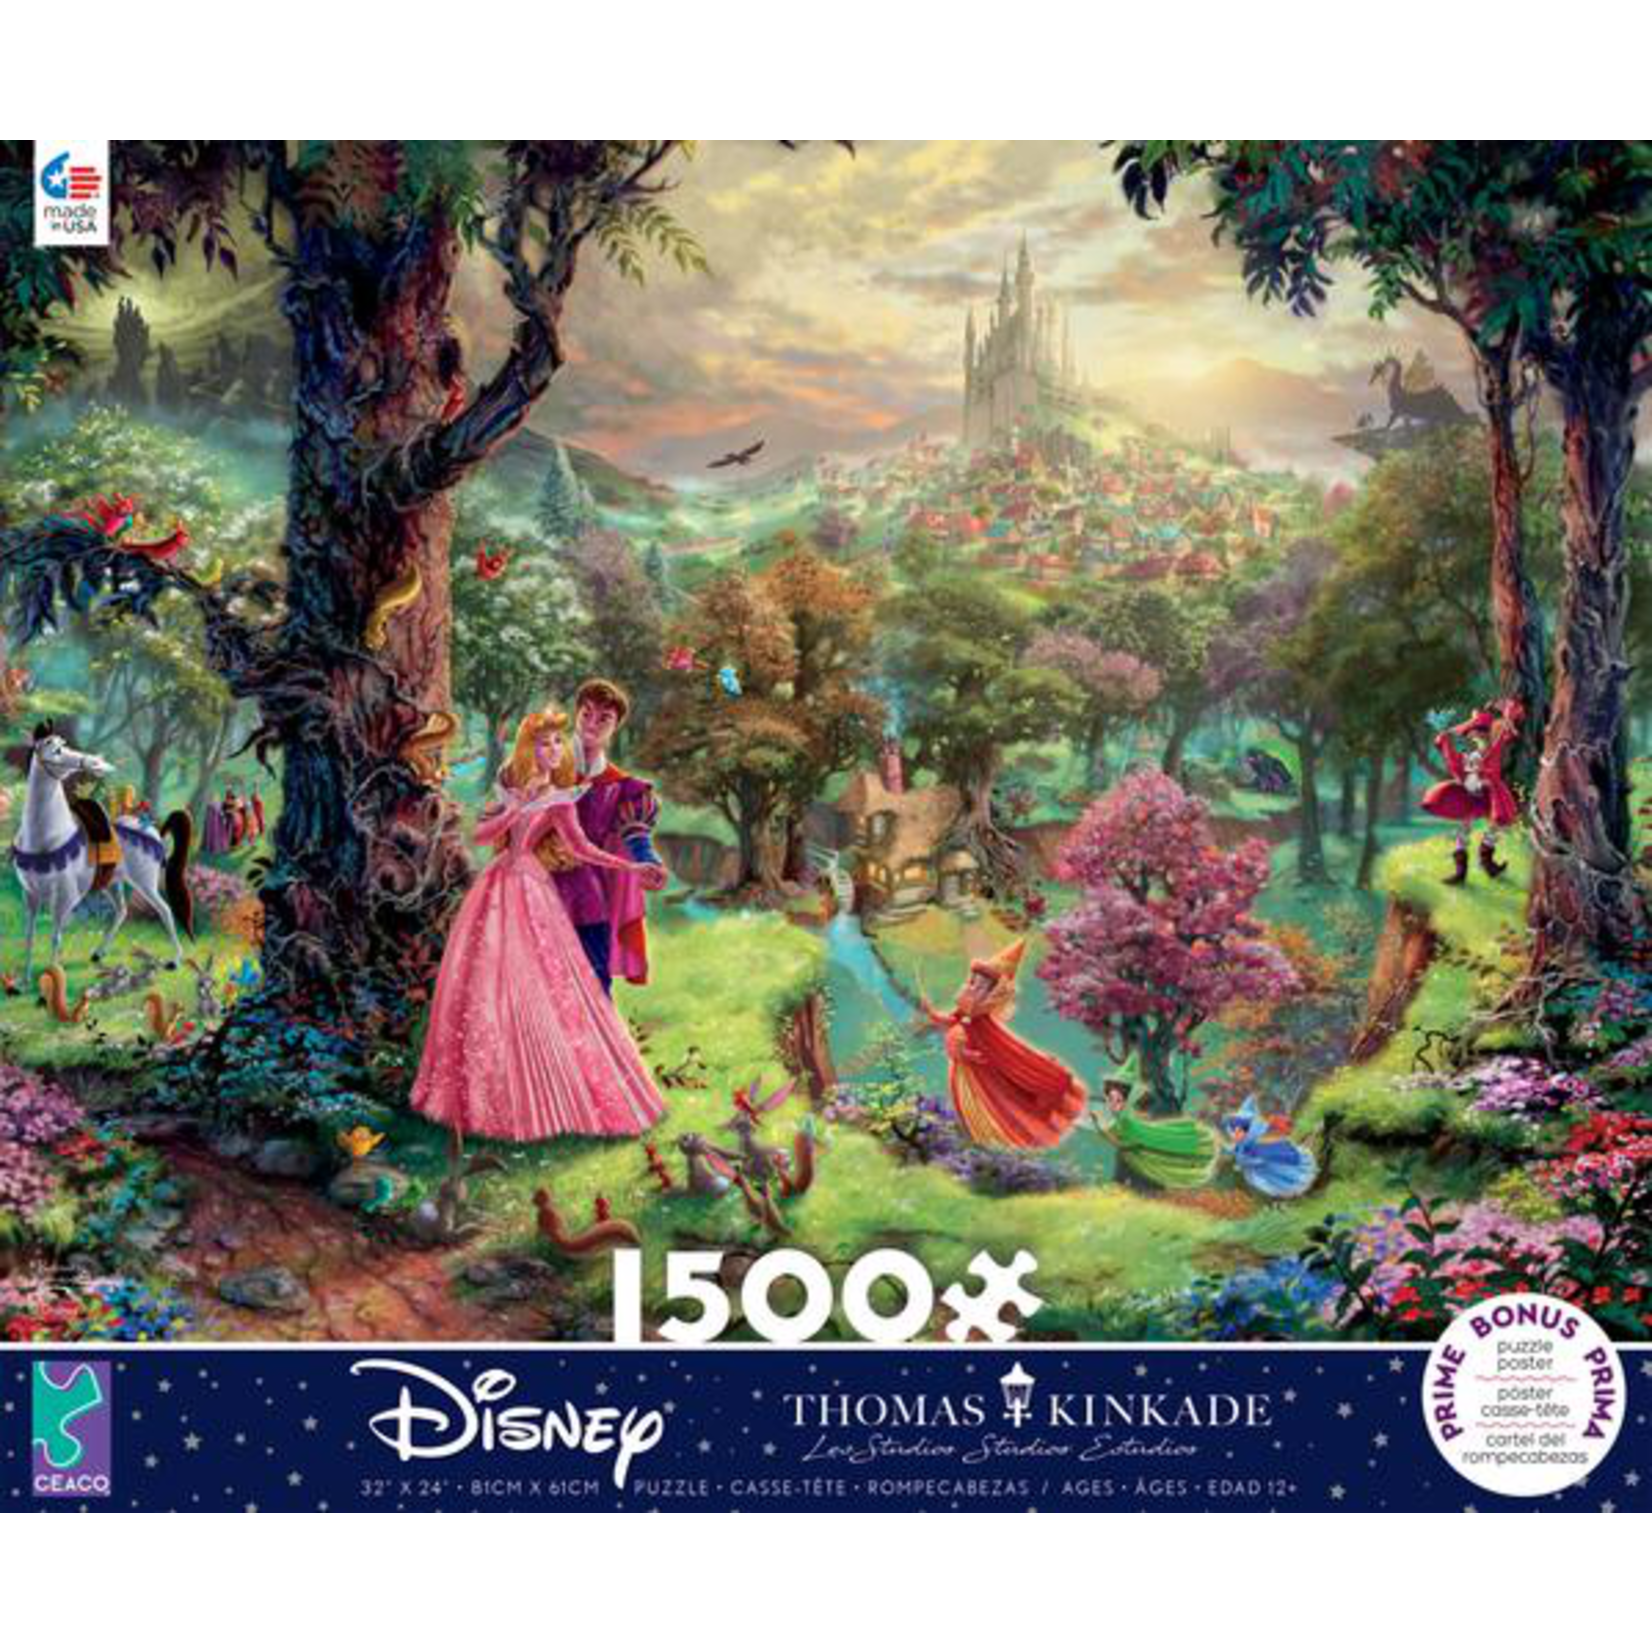 CEACO Disney Sleeping Beauty 1500pc